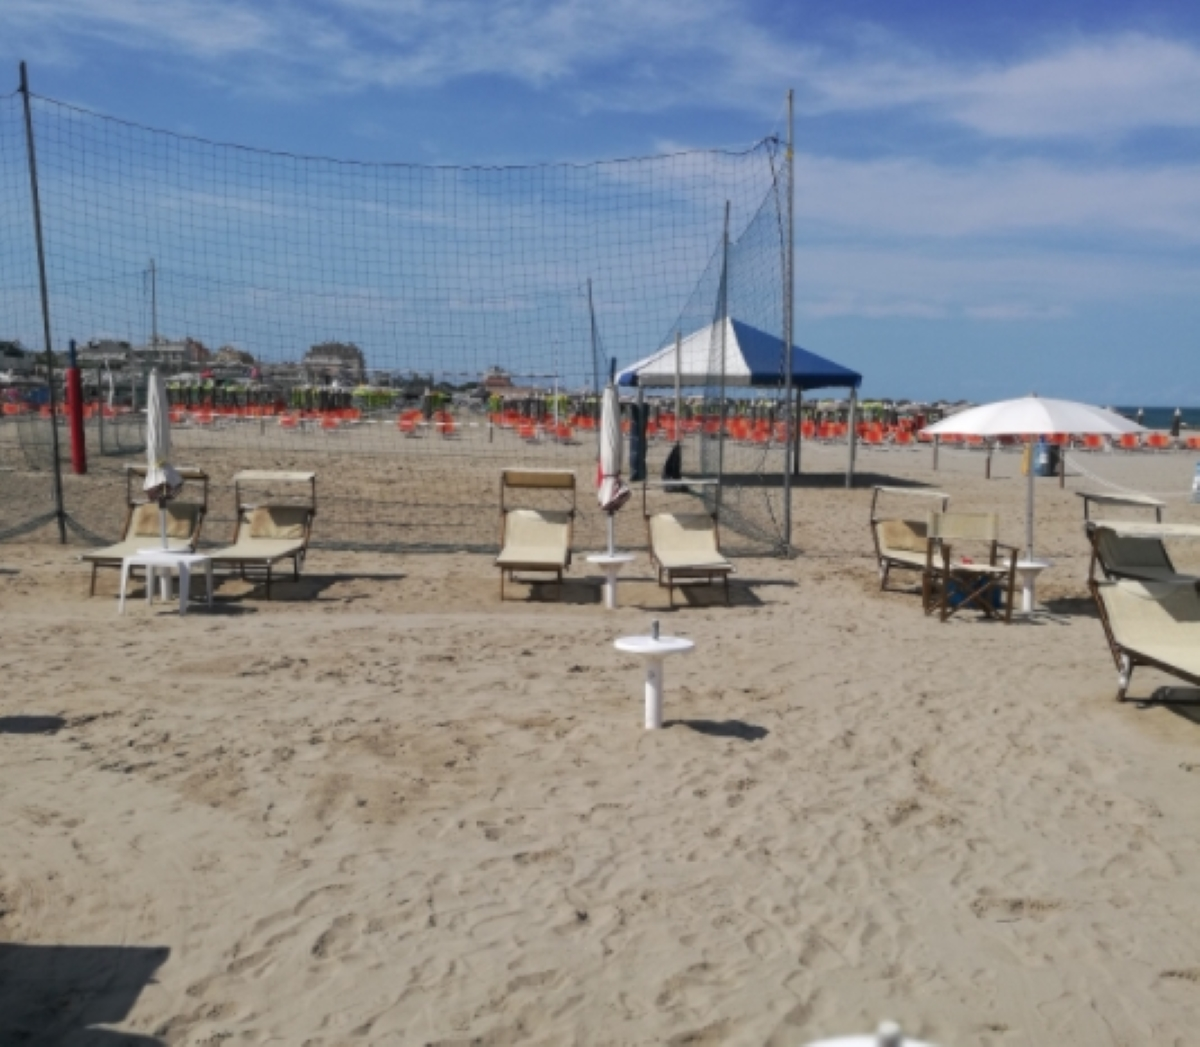 Bagno Playa Del Carmen